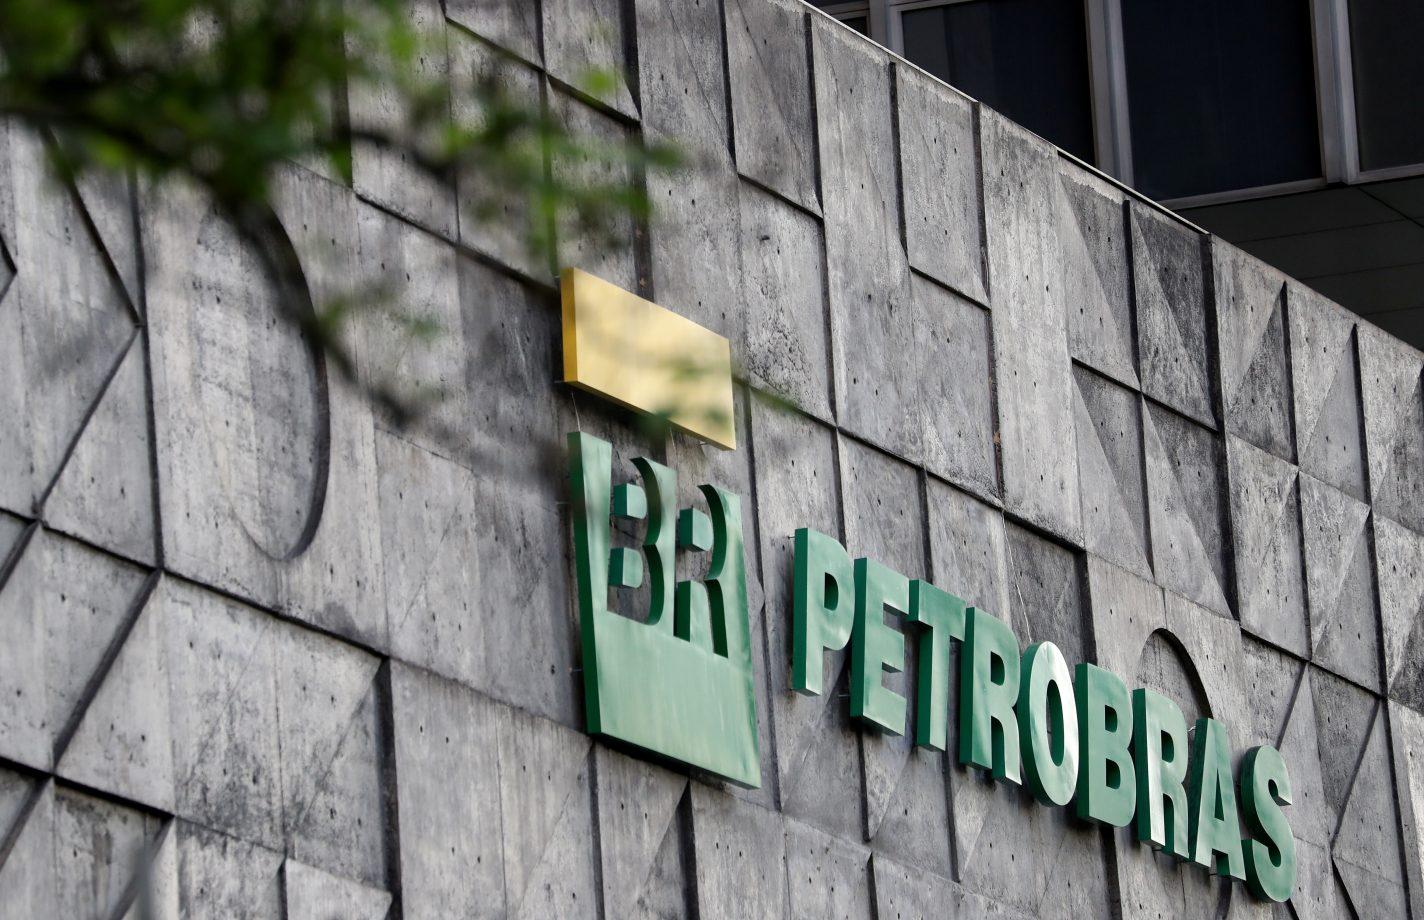 Destaques de Empresas: Petrobras (PETR4), Oi (OIBR3) e Banco Inter